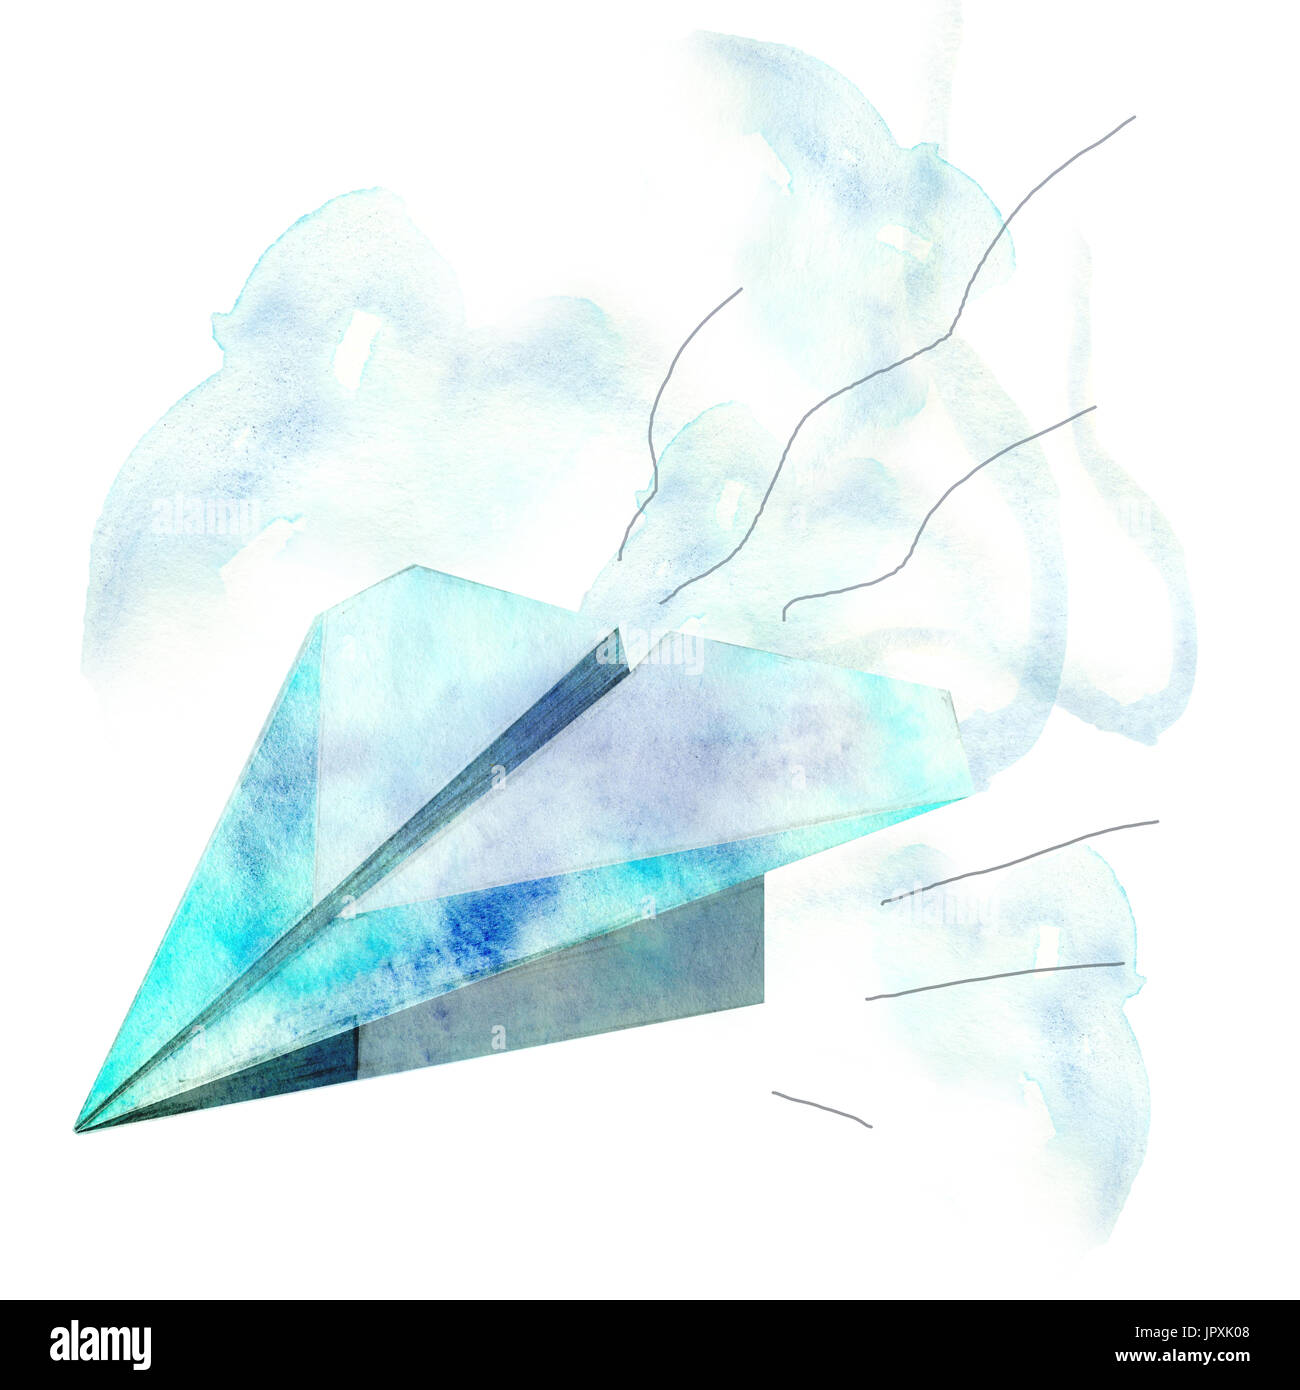 Acuarela dibujada a mano avión de papel Imagen De Stock